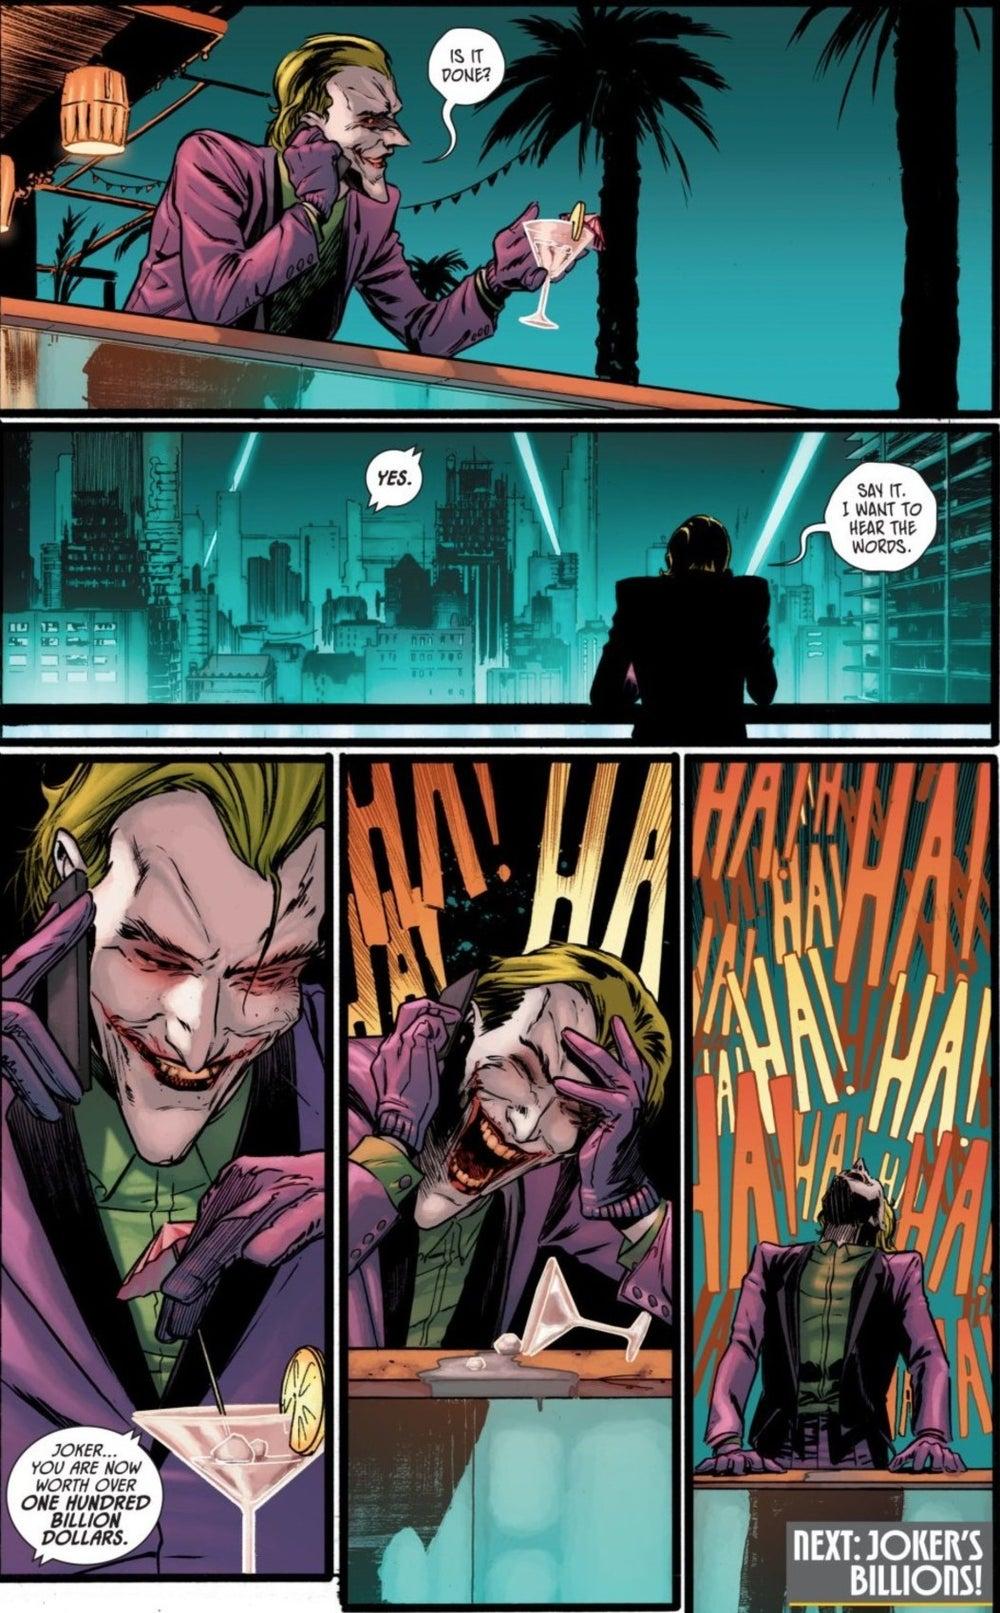 Batman 93 Joker Gets Wayne Fortune Gotham Wealthiest Man